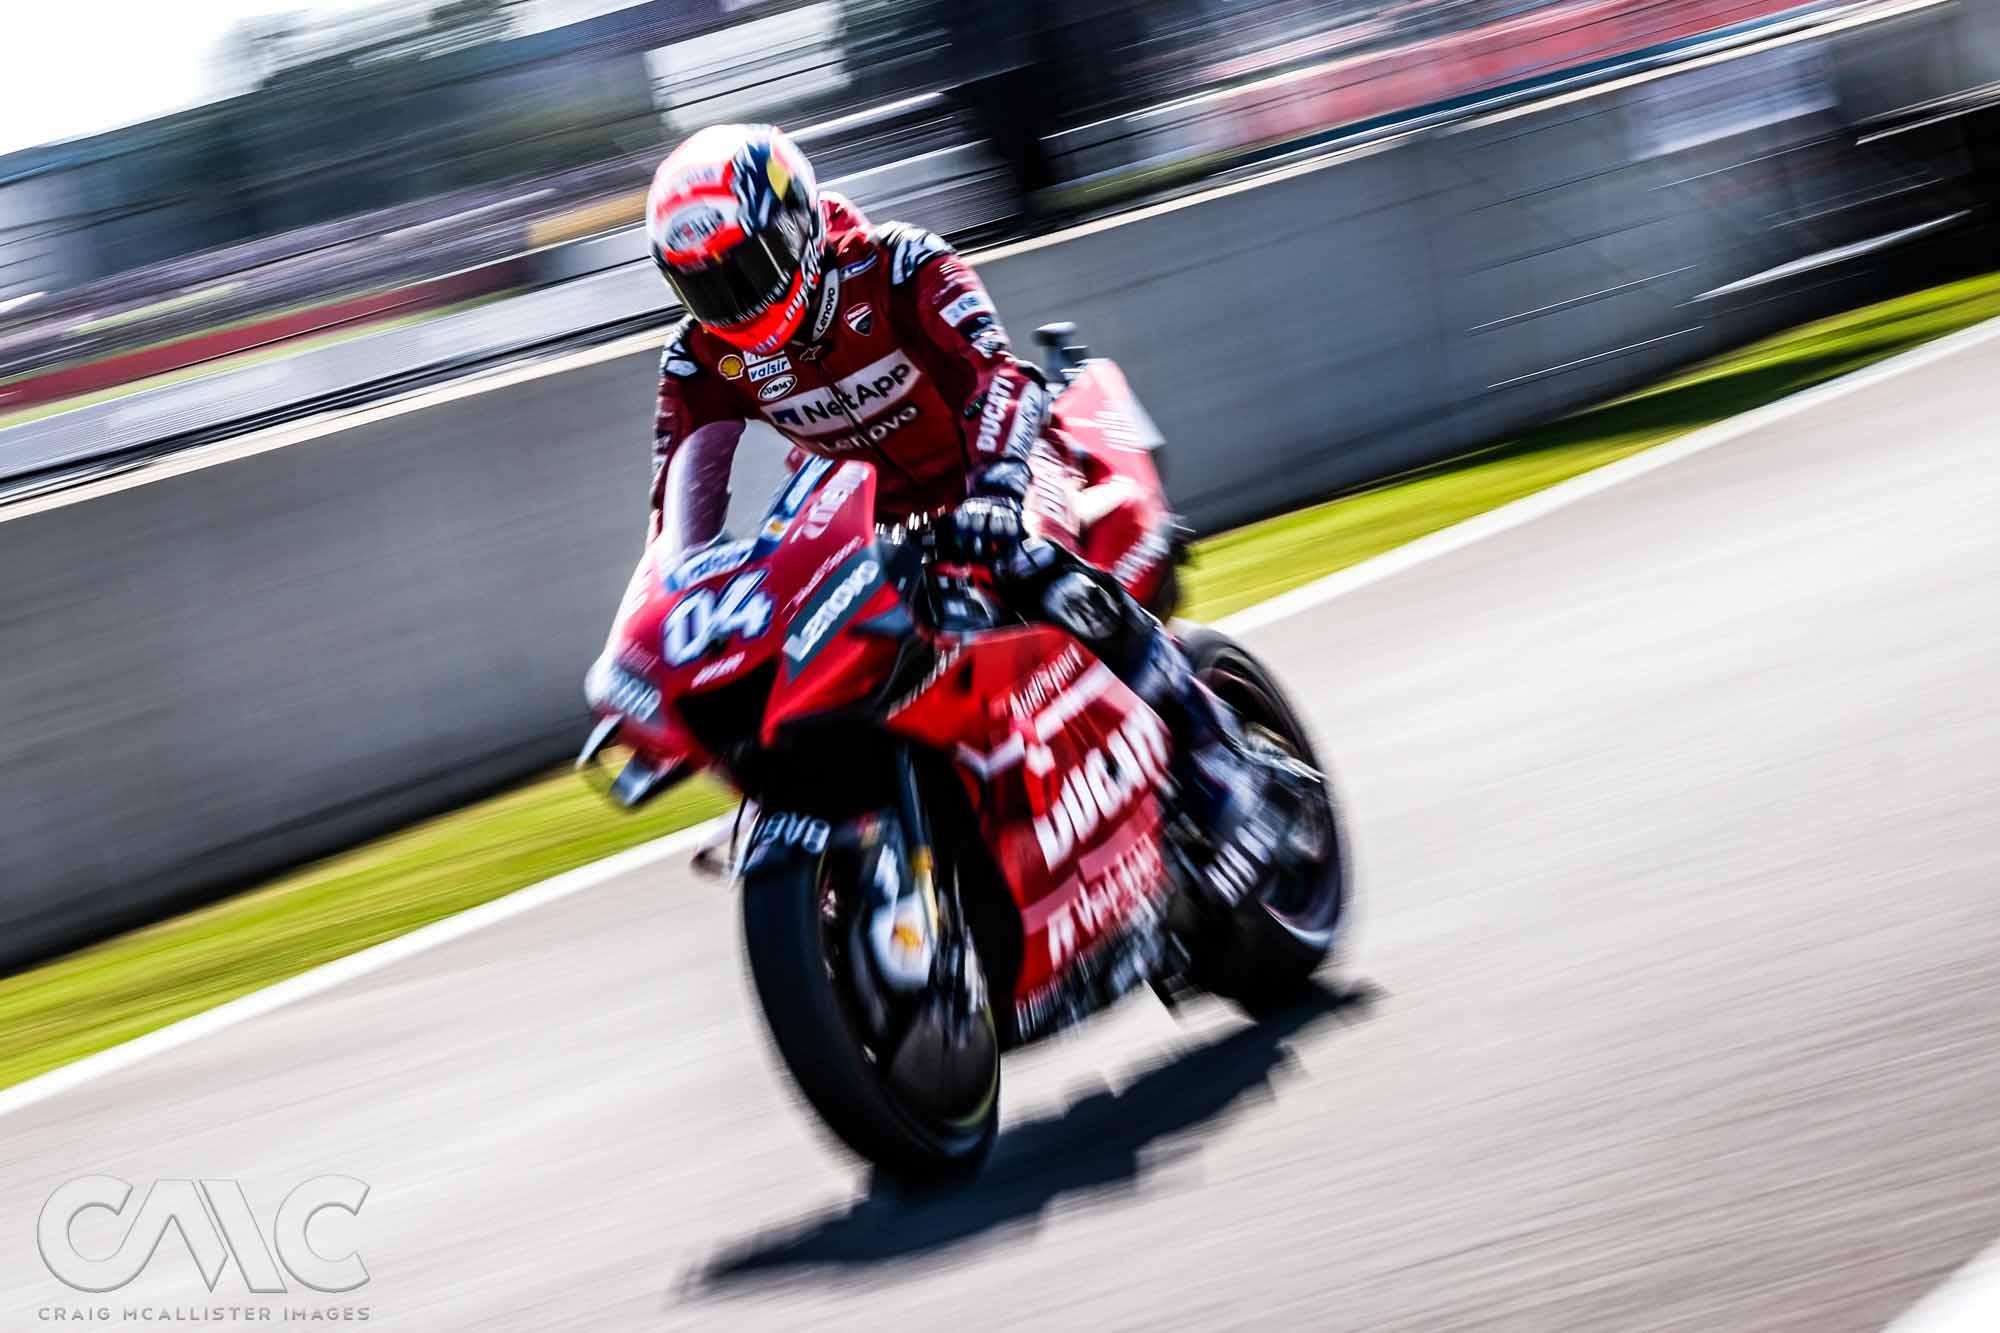 CMC_MotoGP_Qualifying_Silverstone 50-1405404.jpg